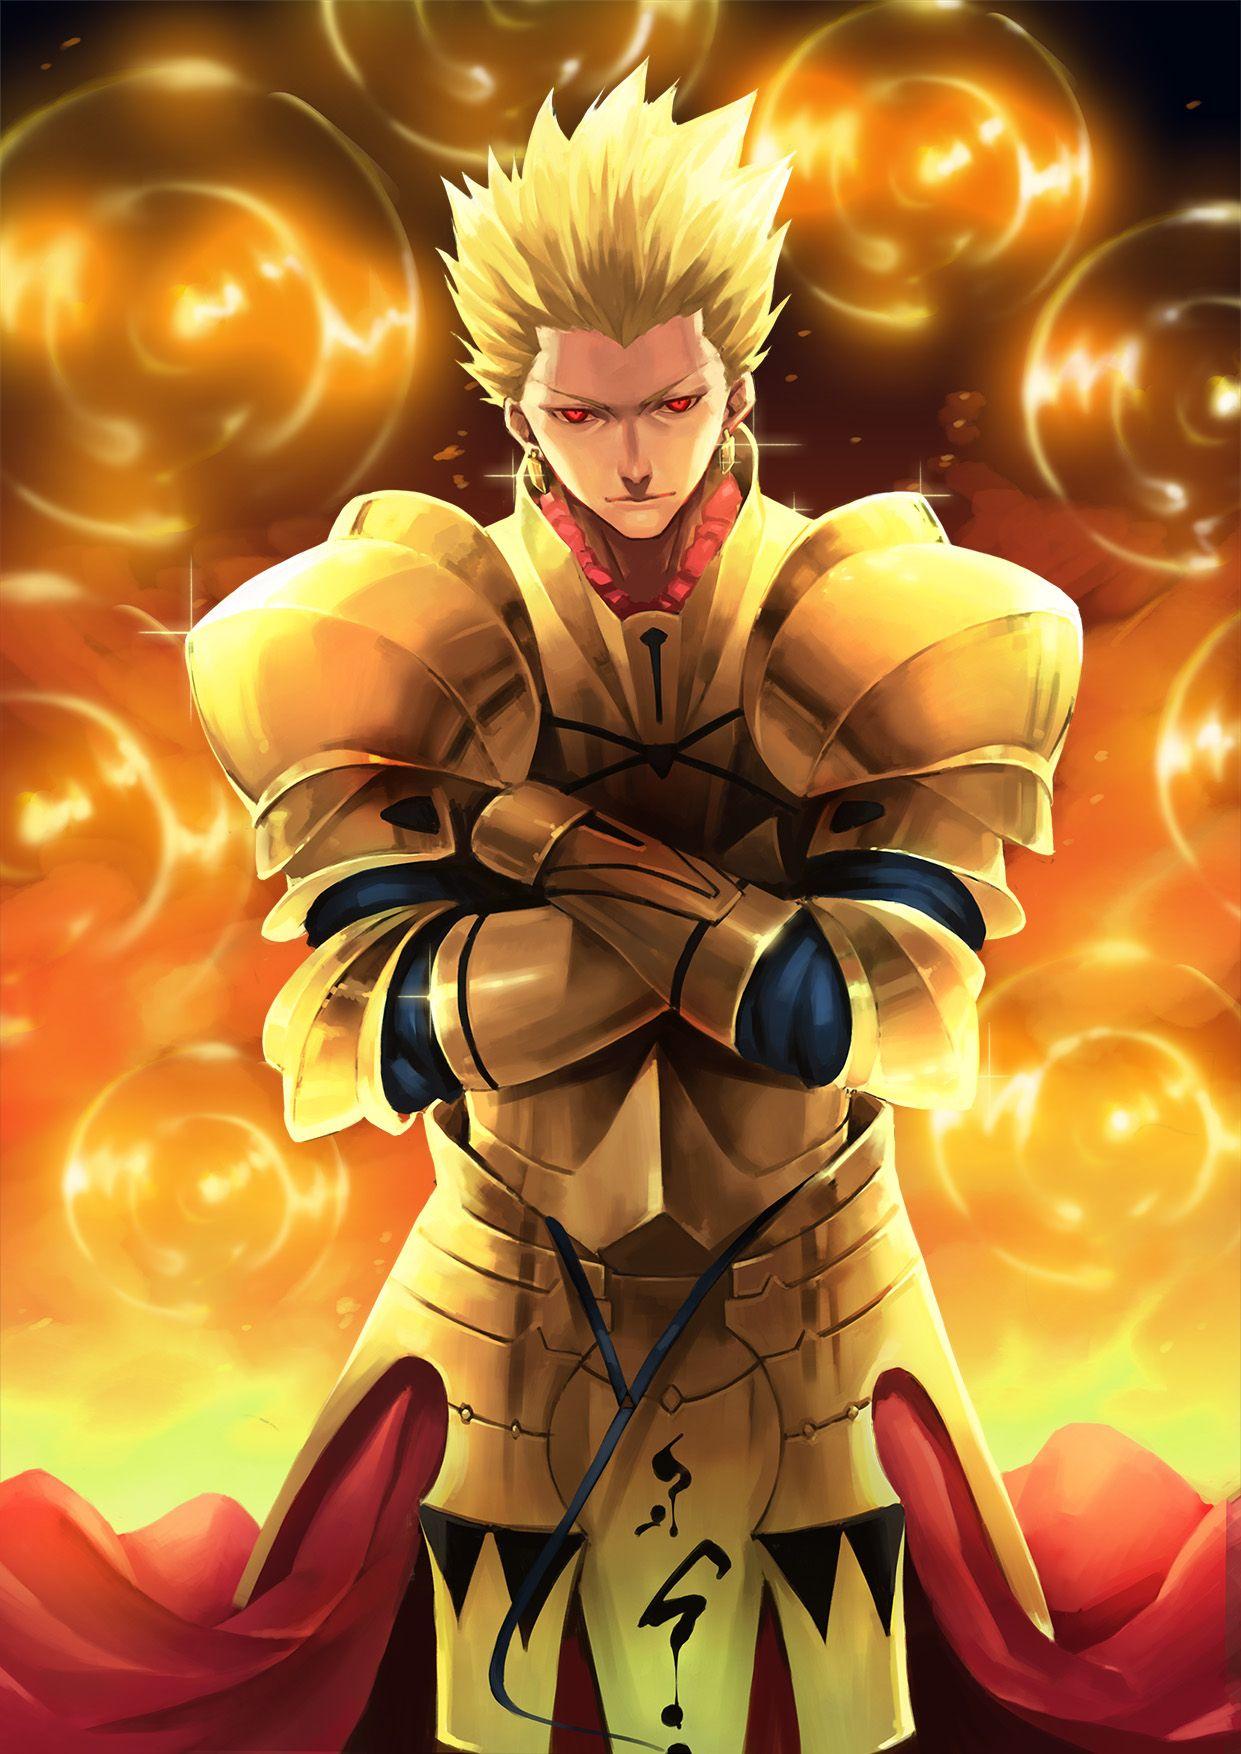 Gilgamesh Gilgamesh Fate Fate Anime Series Fate Characters